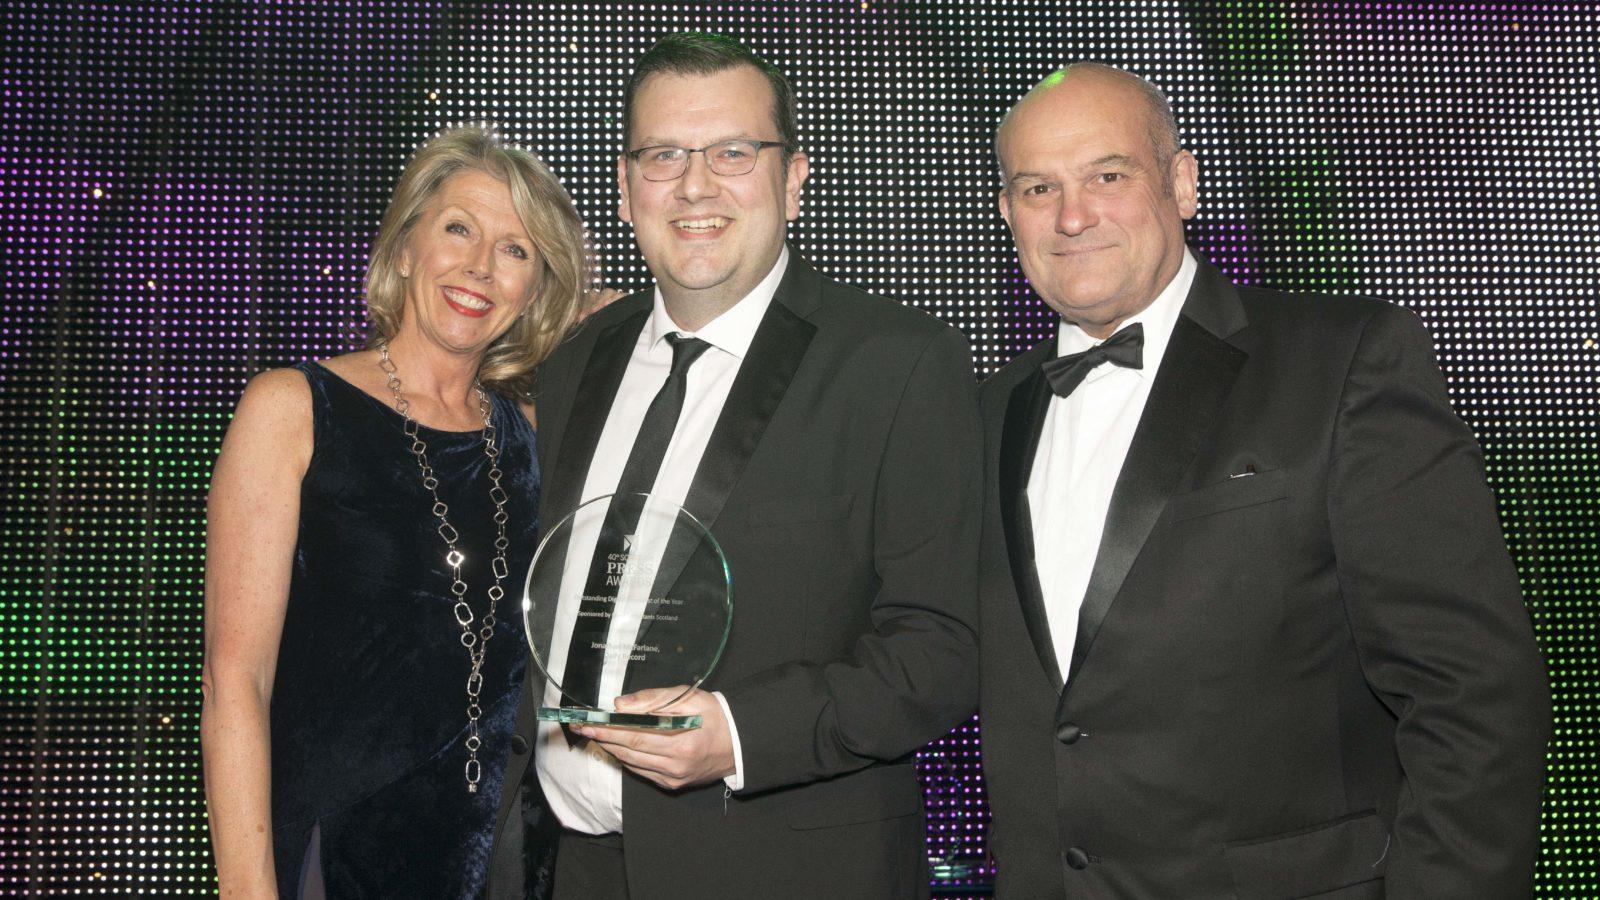 Outstanding Digital Journalist of the Year Winner Jonathan McFarlane, Daily Record